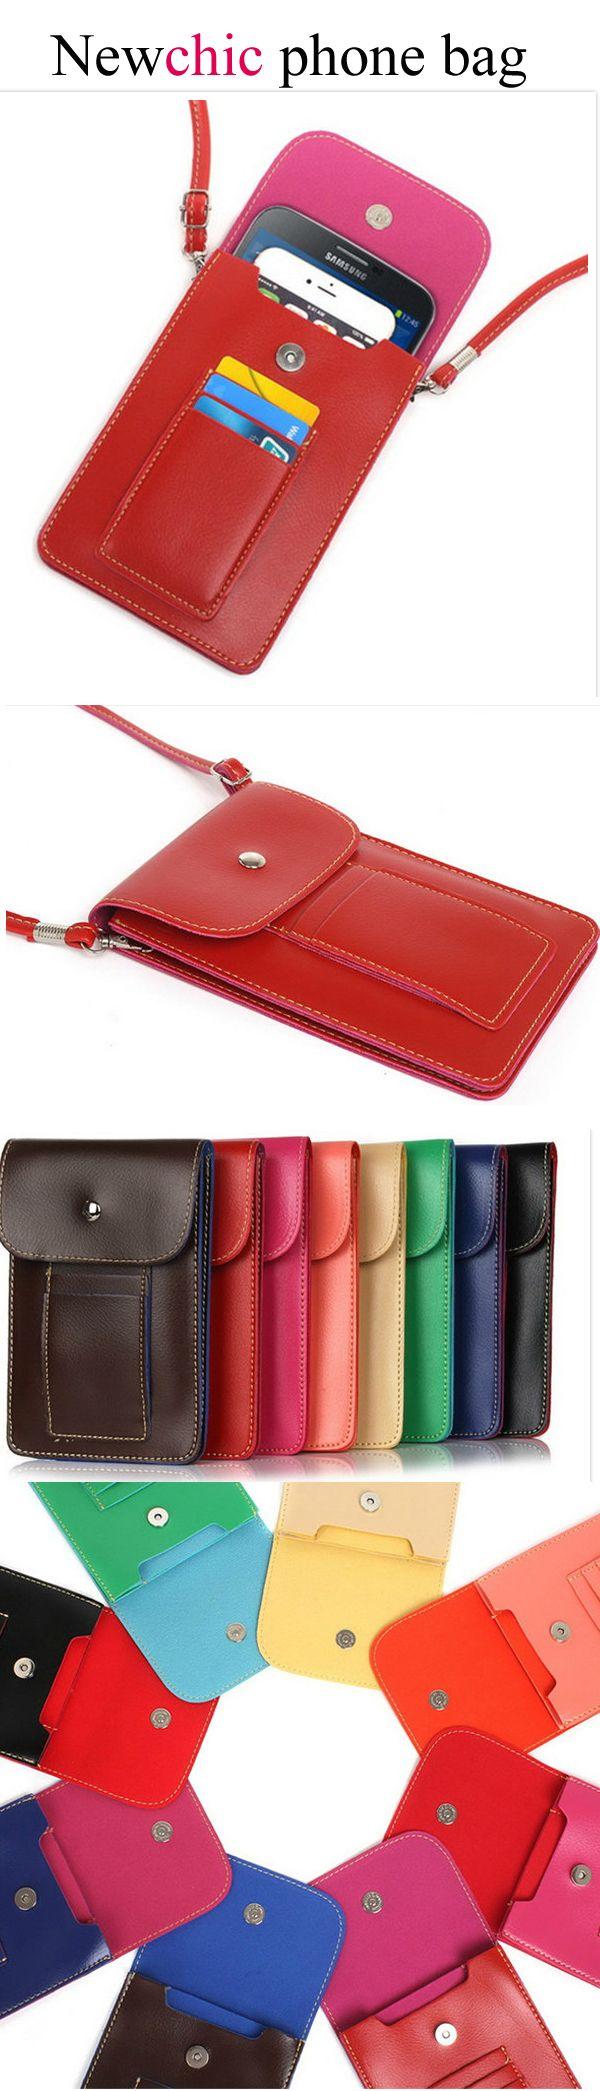 【$ 9.16】 Women PU Leather 6.3 Inch Phone Bag Card Holder Crossbody Bag